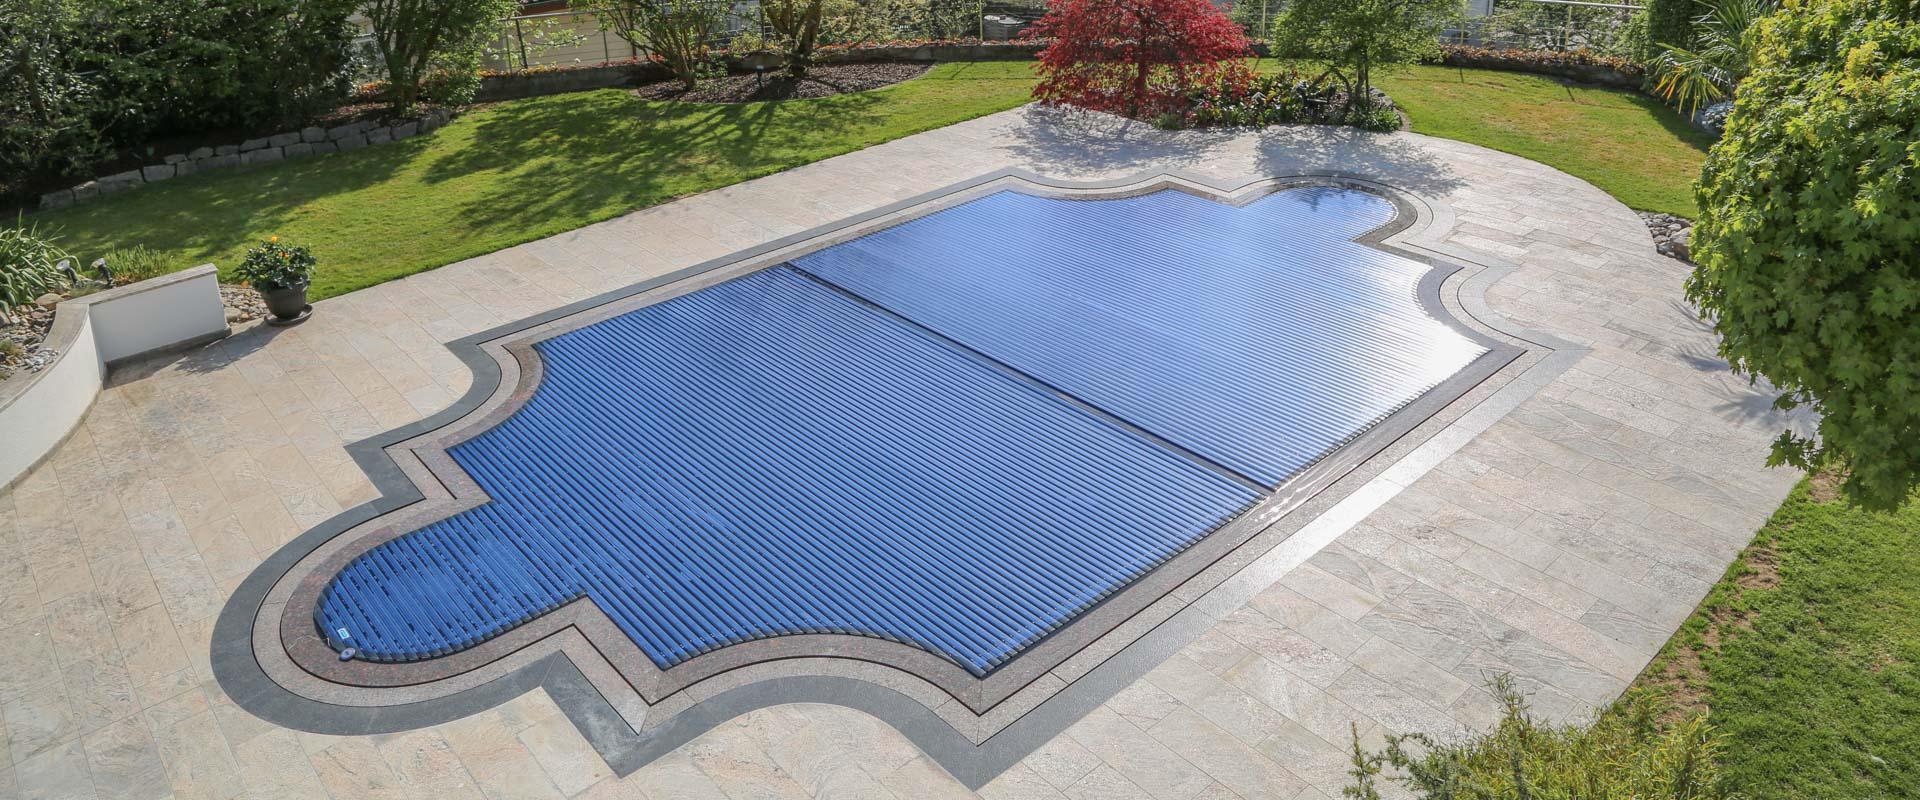 Automatic poolcovers since 1963 - grando GmbH (EN)